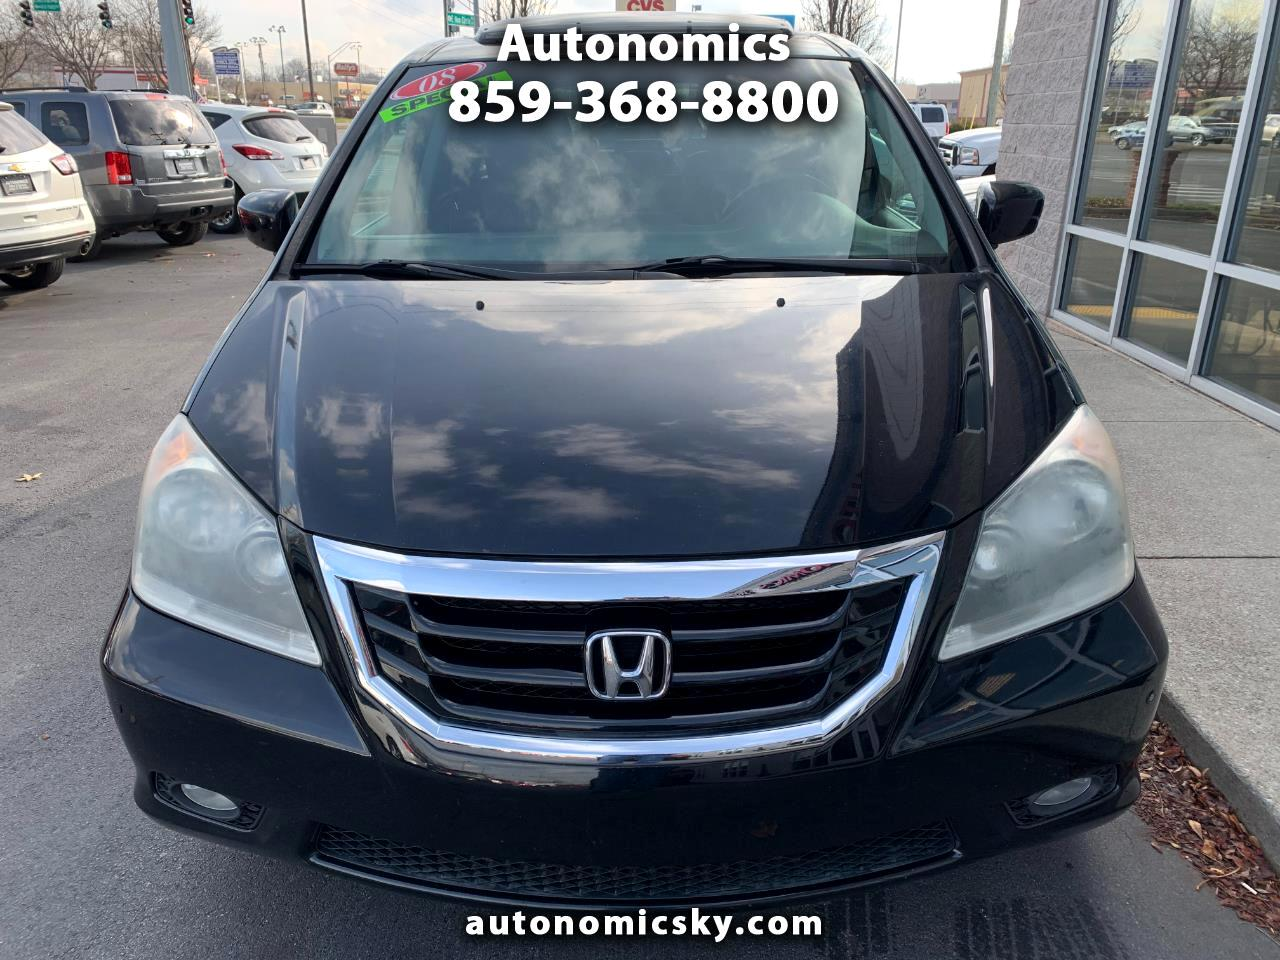 Honda Odyssey 5dr Touring w/PAX 2008